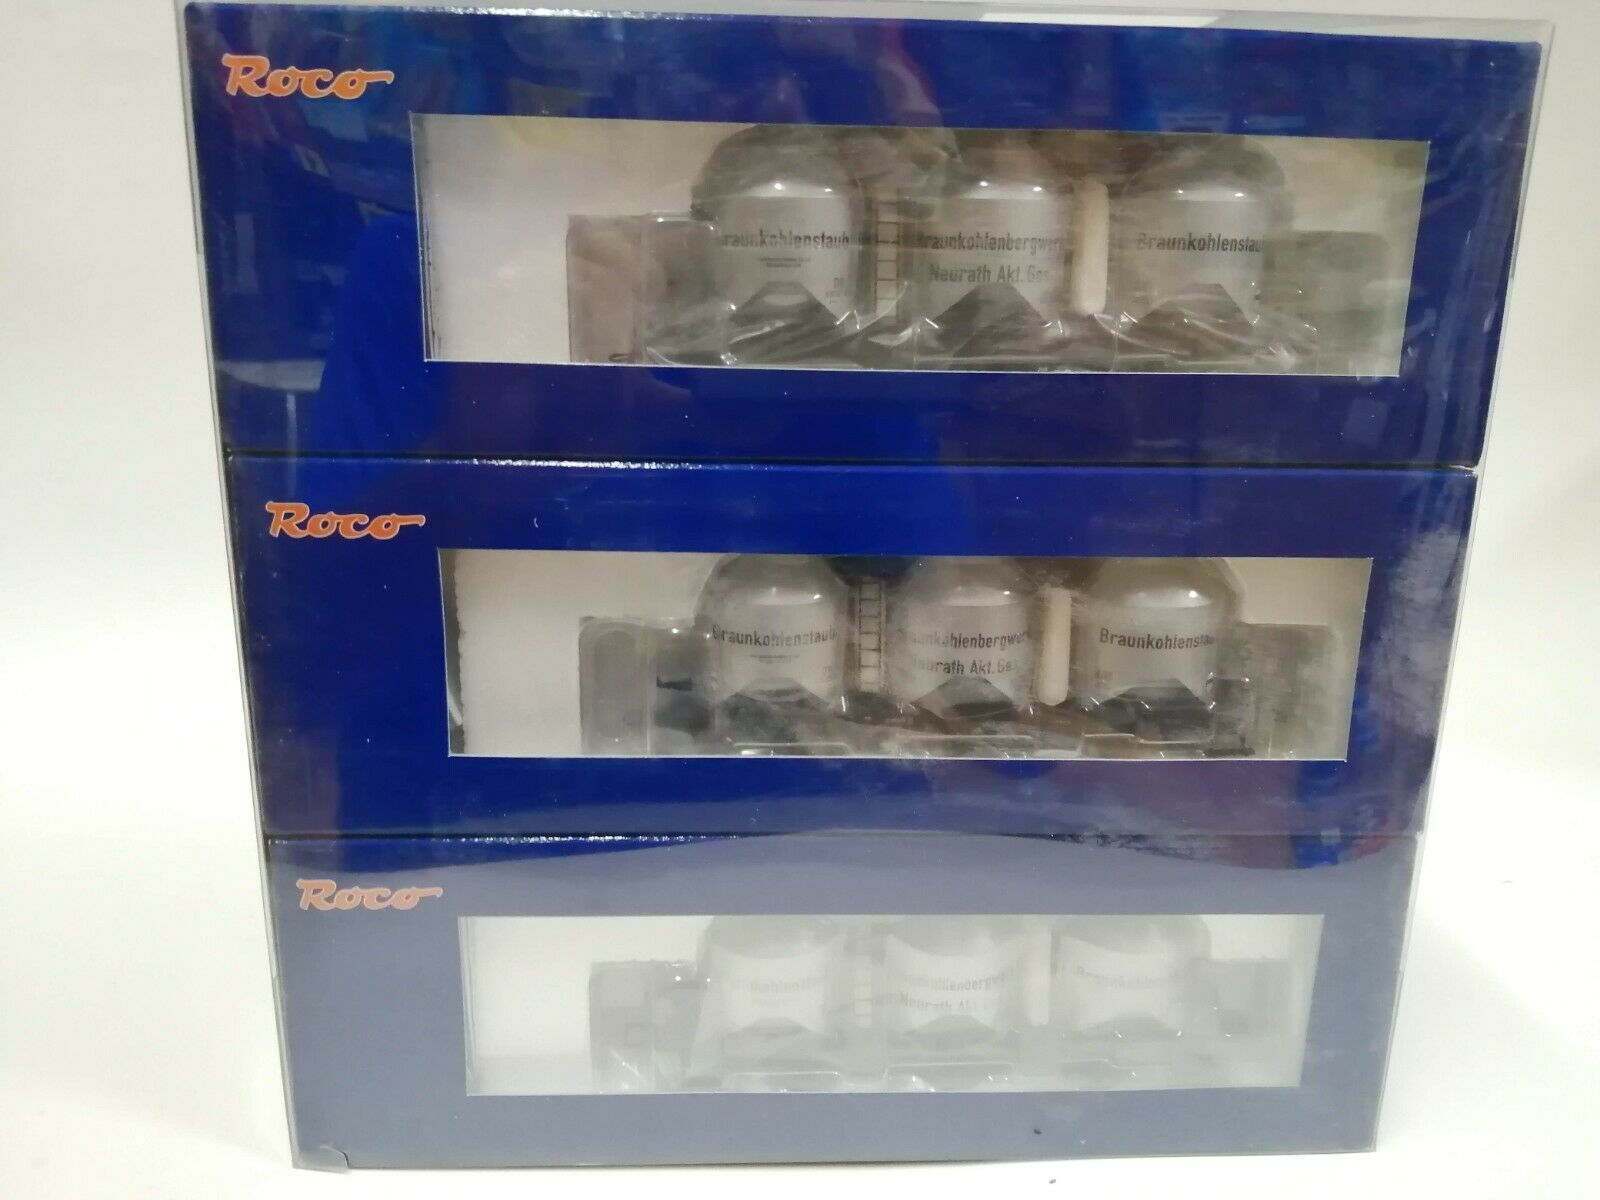 ROCO 66091 h0 3 pezzi polvere Caldaia autorelloSet DB NuovoScatola OriginaleCon Garanzia